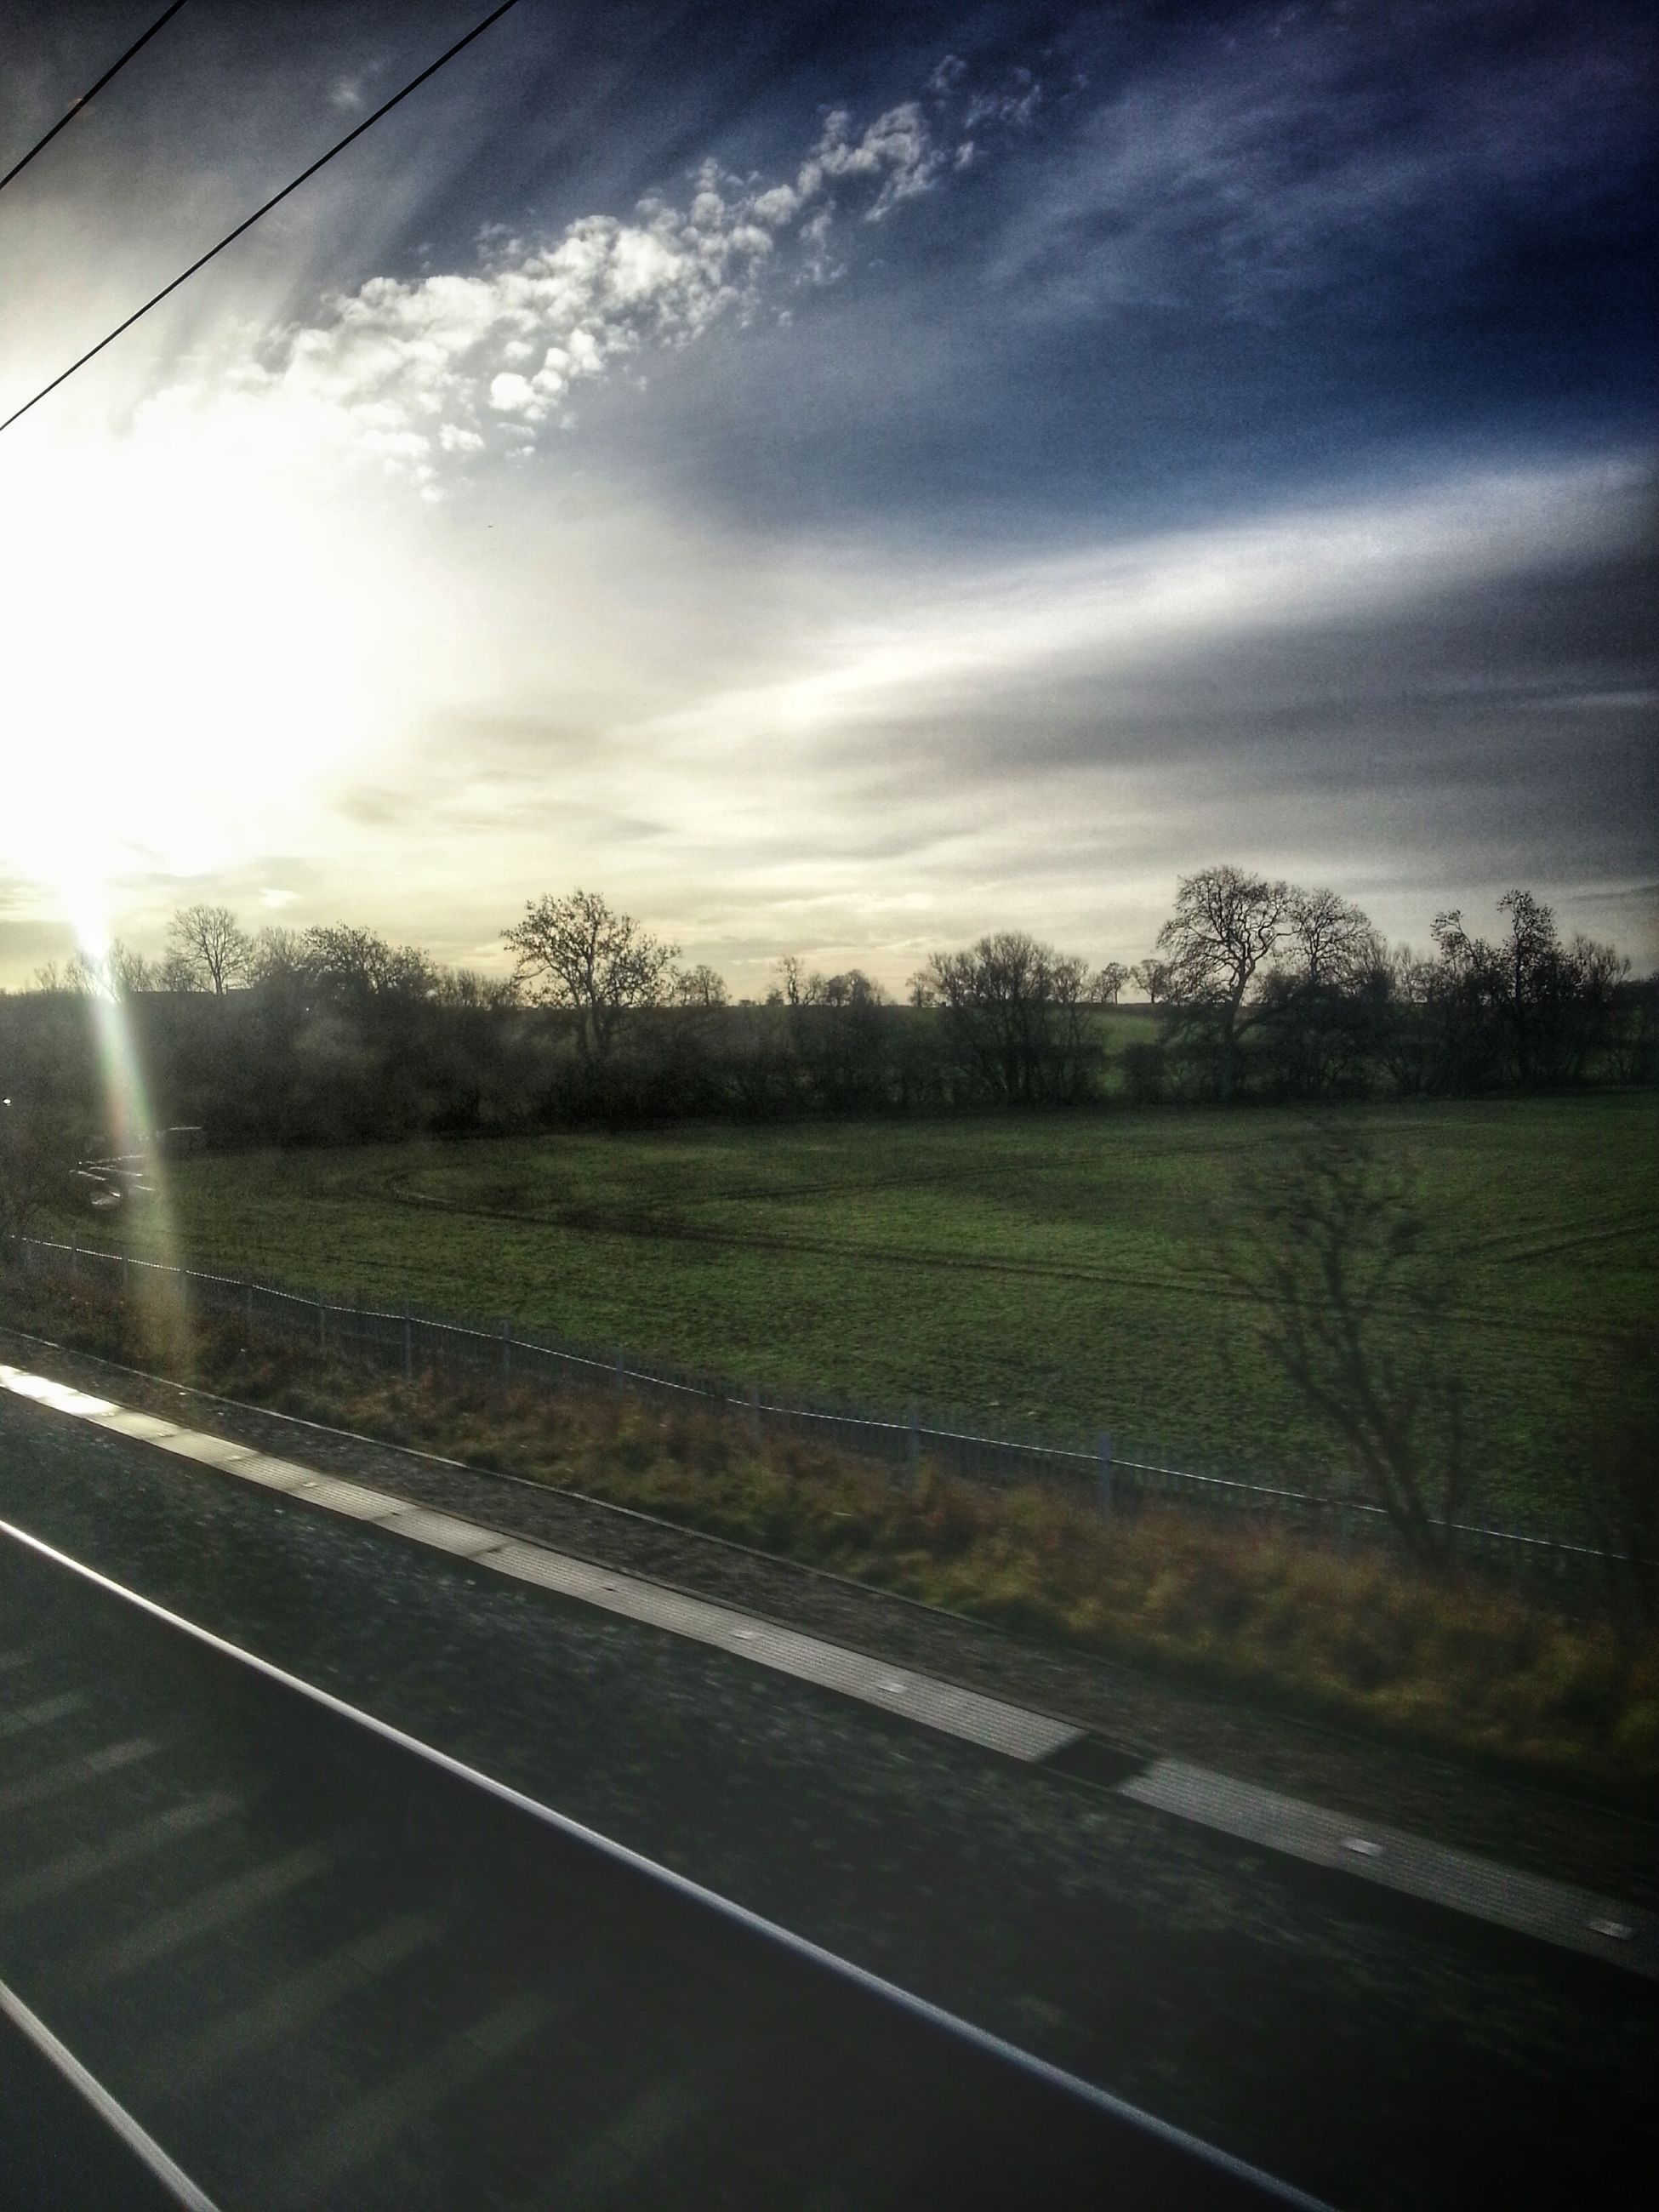 transportation, road, tree, sky, cloud - sky, landscape, sunlight, road marking, the way forward, country road, field, cloud, nature, railroad track, sun, sunbeam, growth, no people, street, day